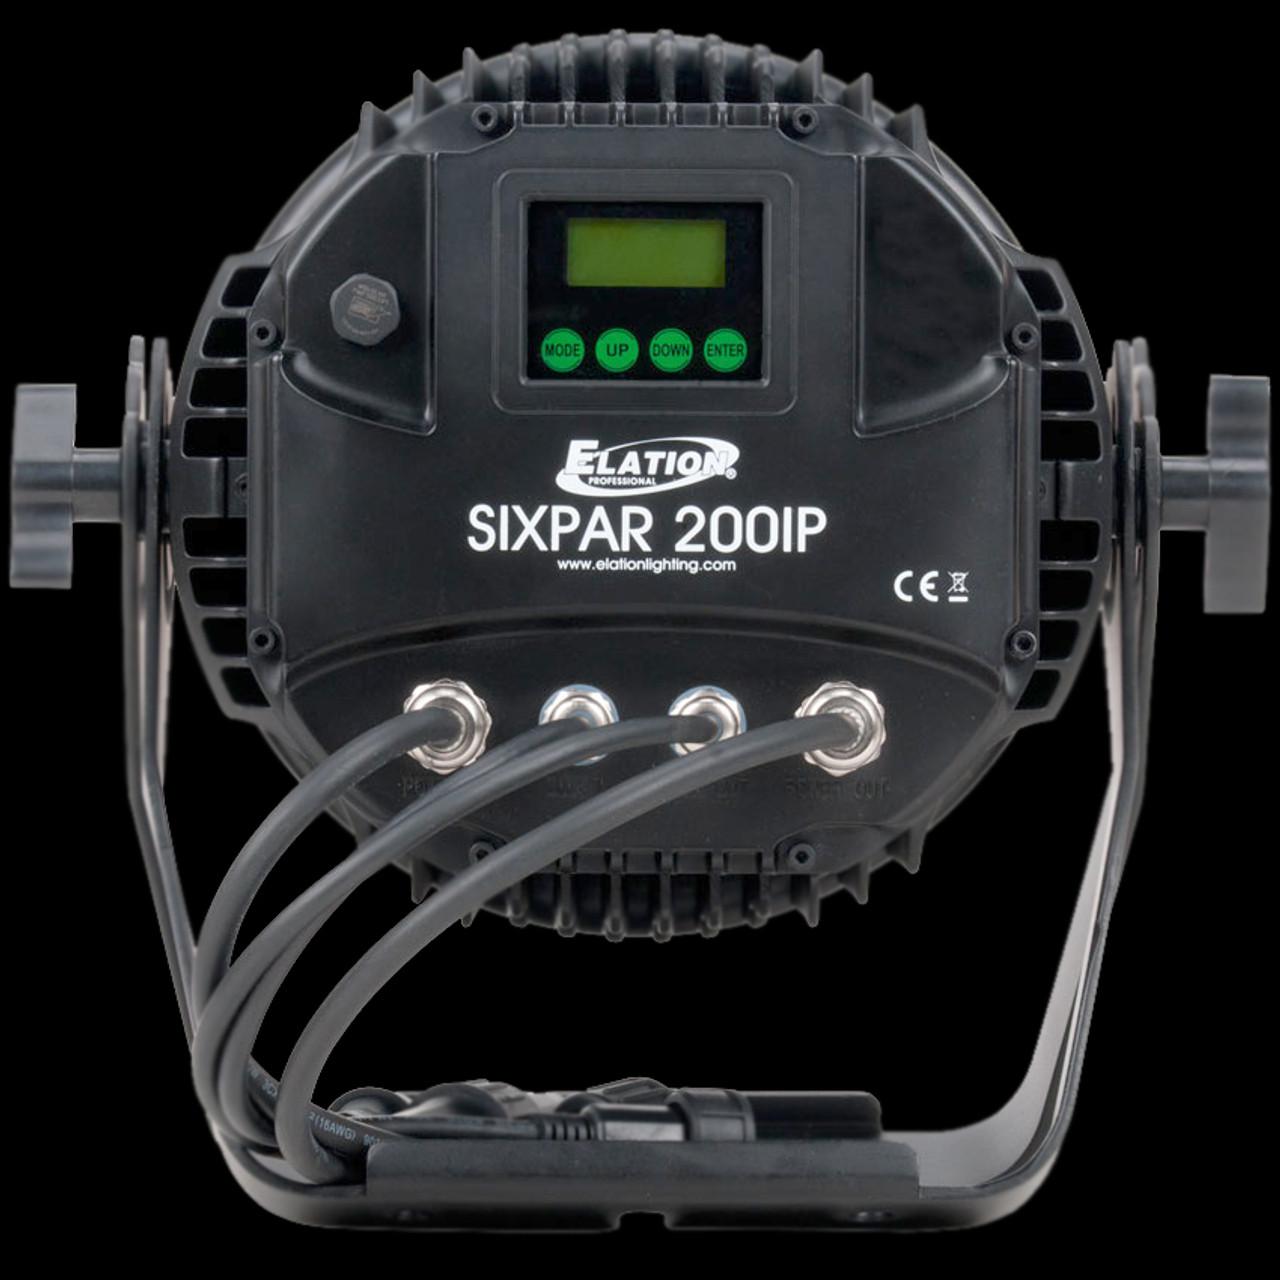 Elation Six Par 200 IP Outdoor LED Par Can Light / RGBAW+UV